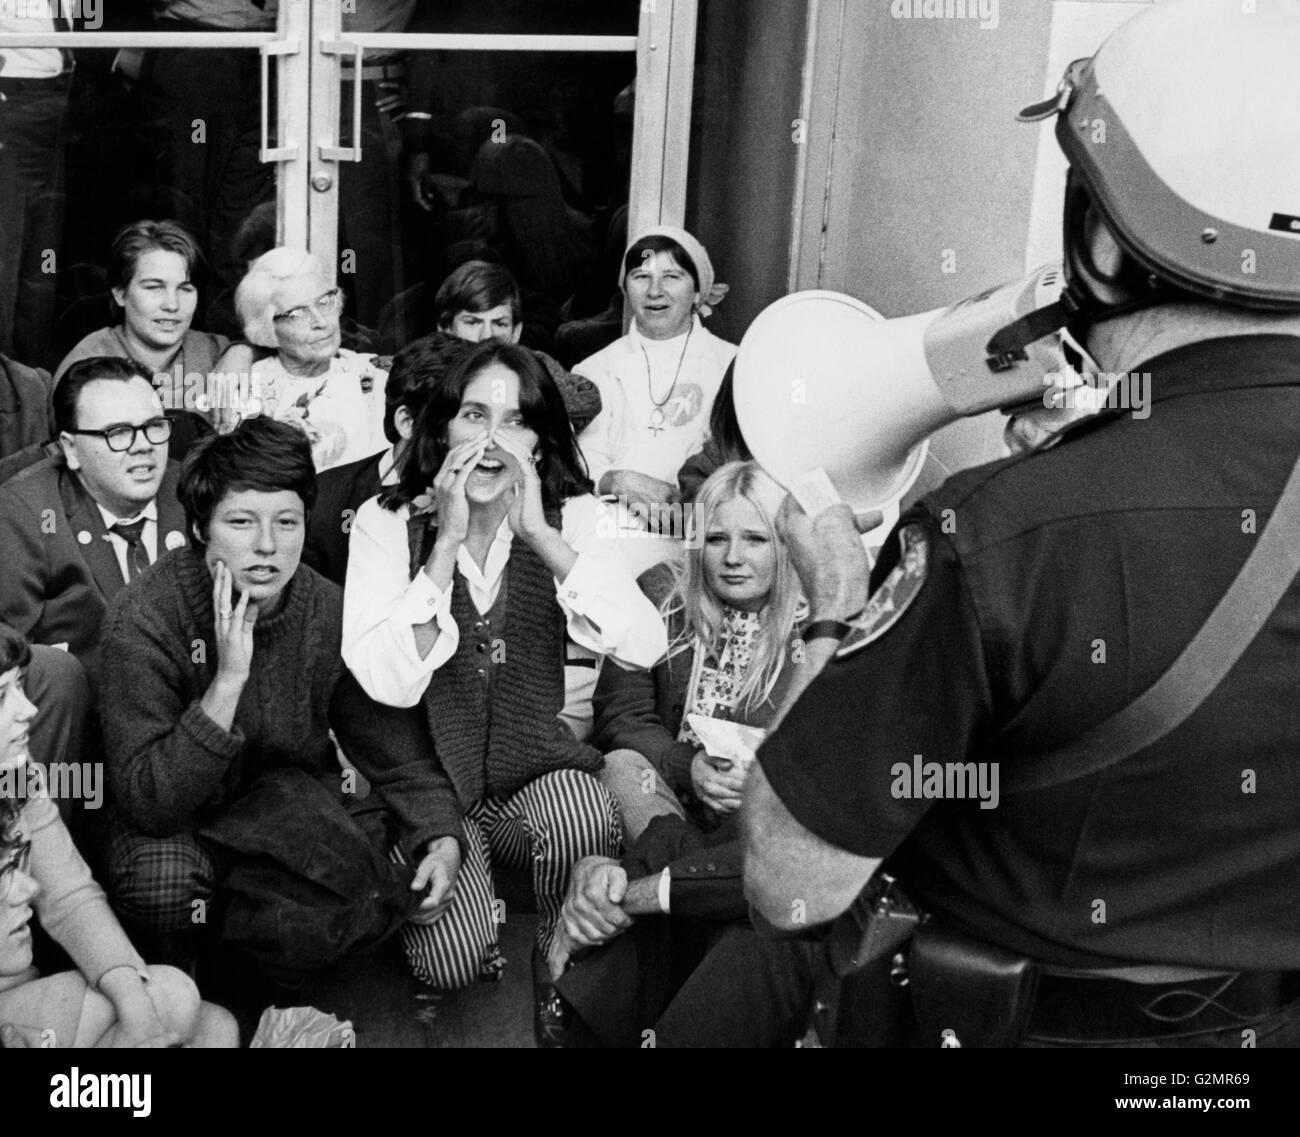 oakland,singer Joan Baez during an antiwar demonstration,1967 - Stock Image